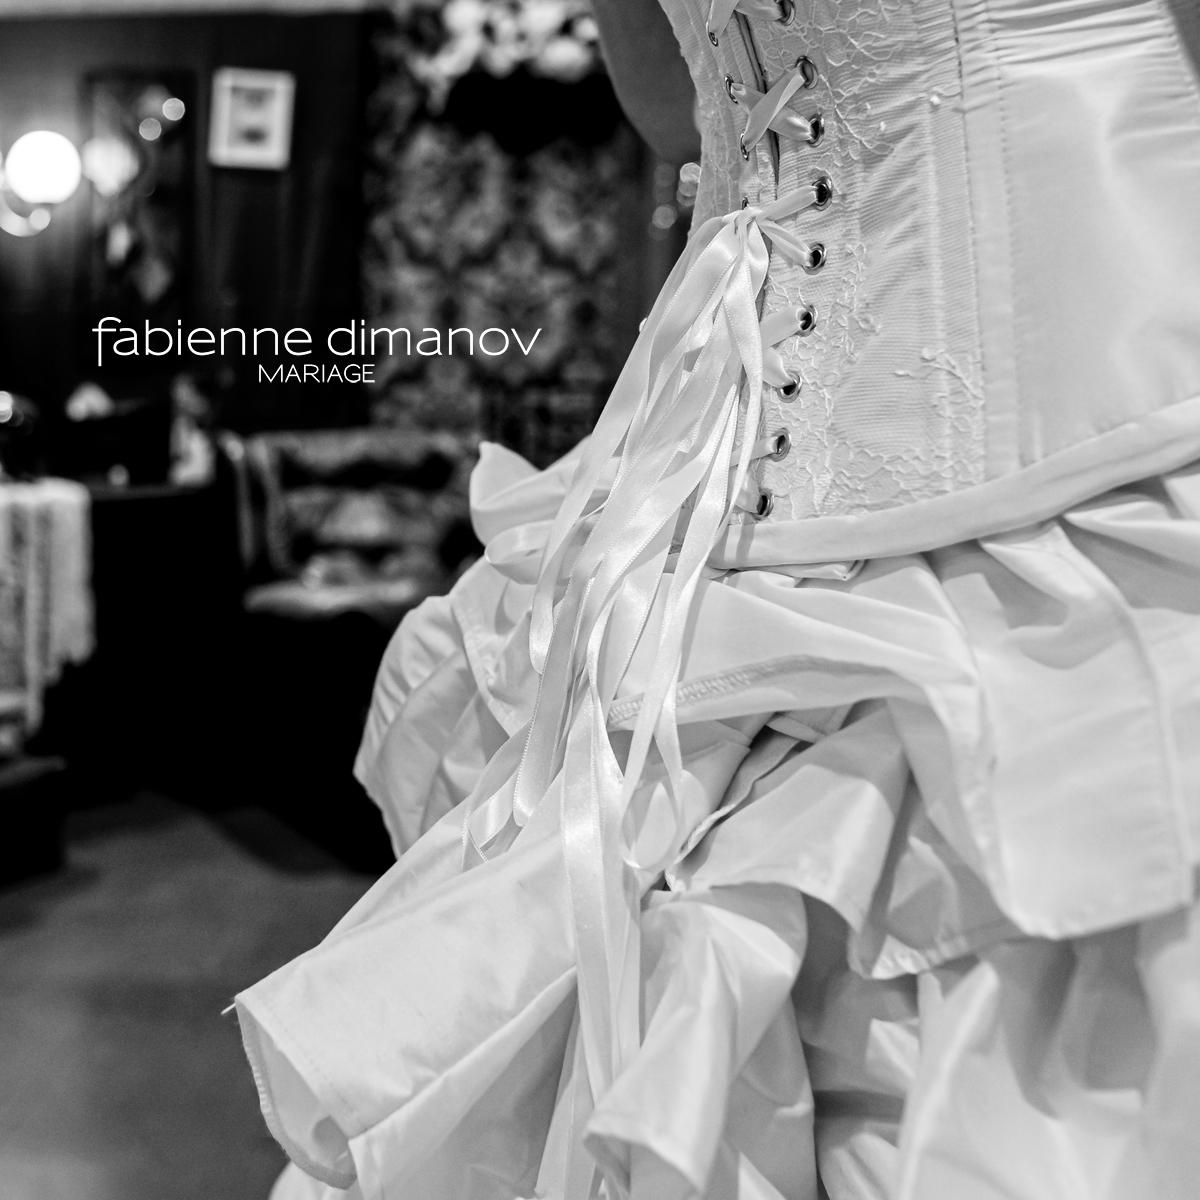 Corset Mariage - Fabienne Dimanov Mariage